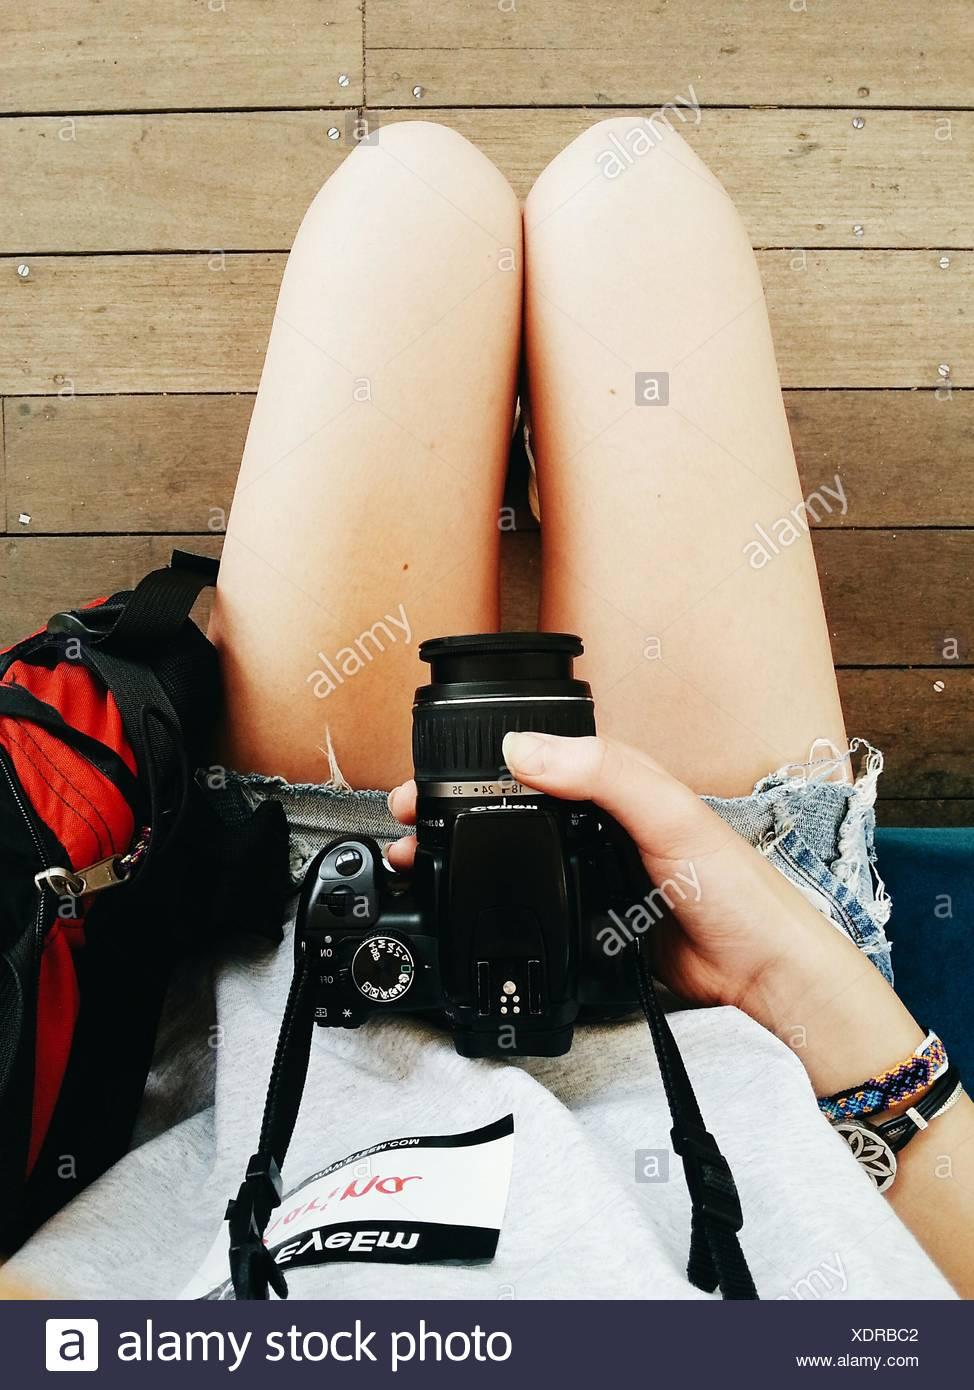 Woman Holding Camera - Stock Image